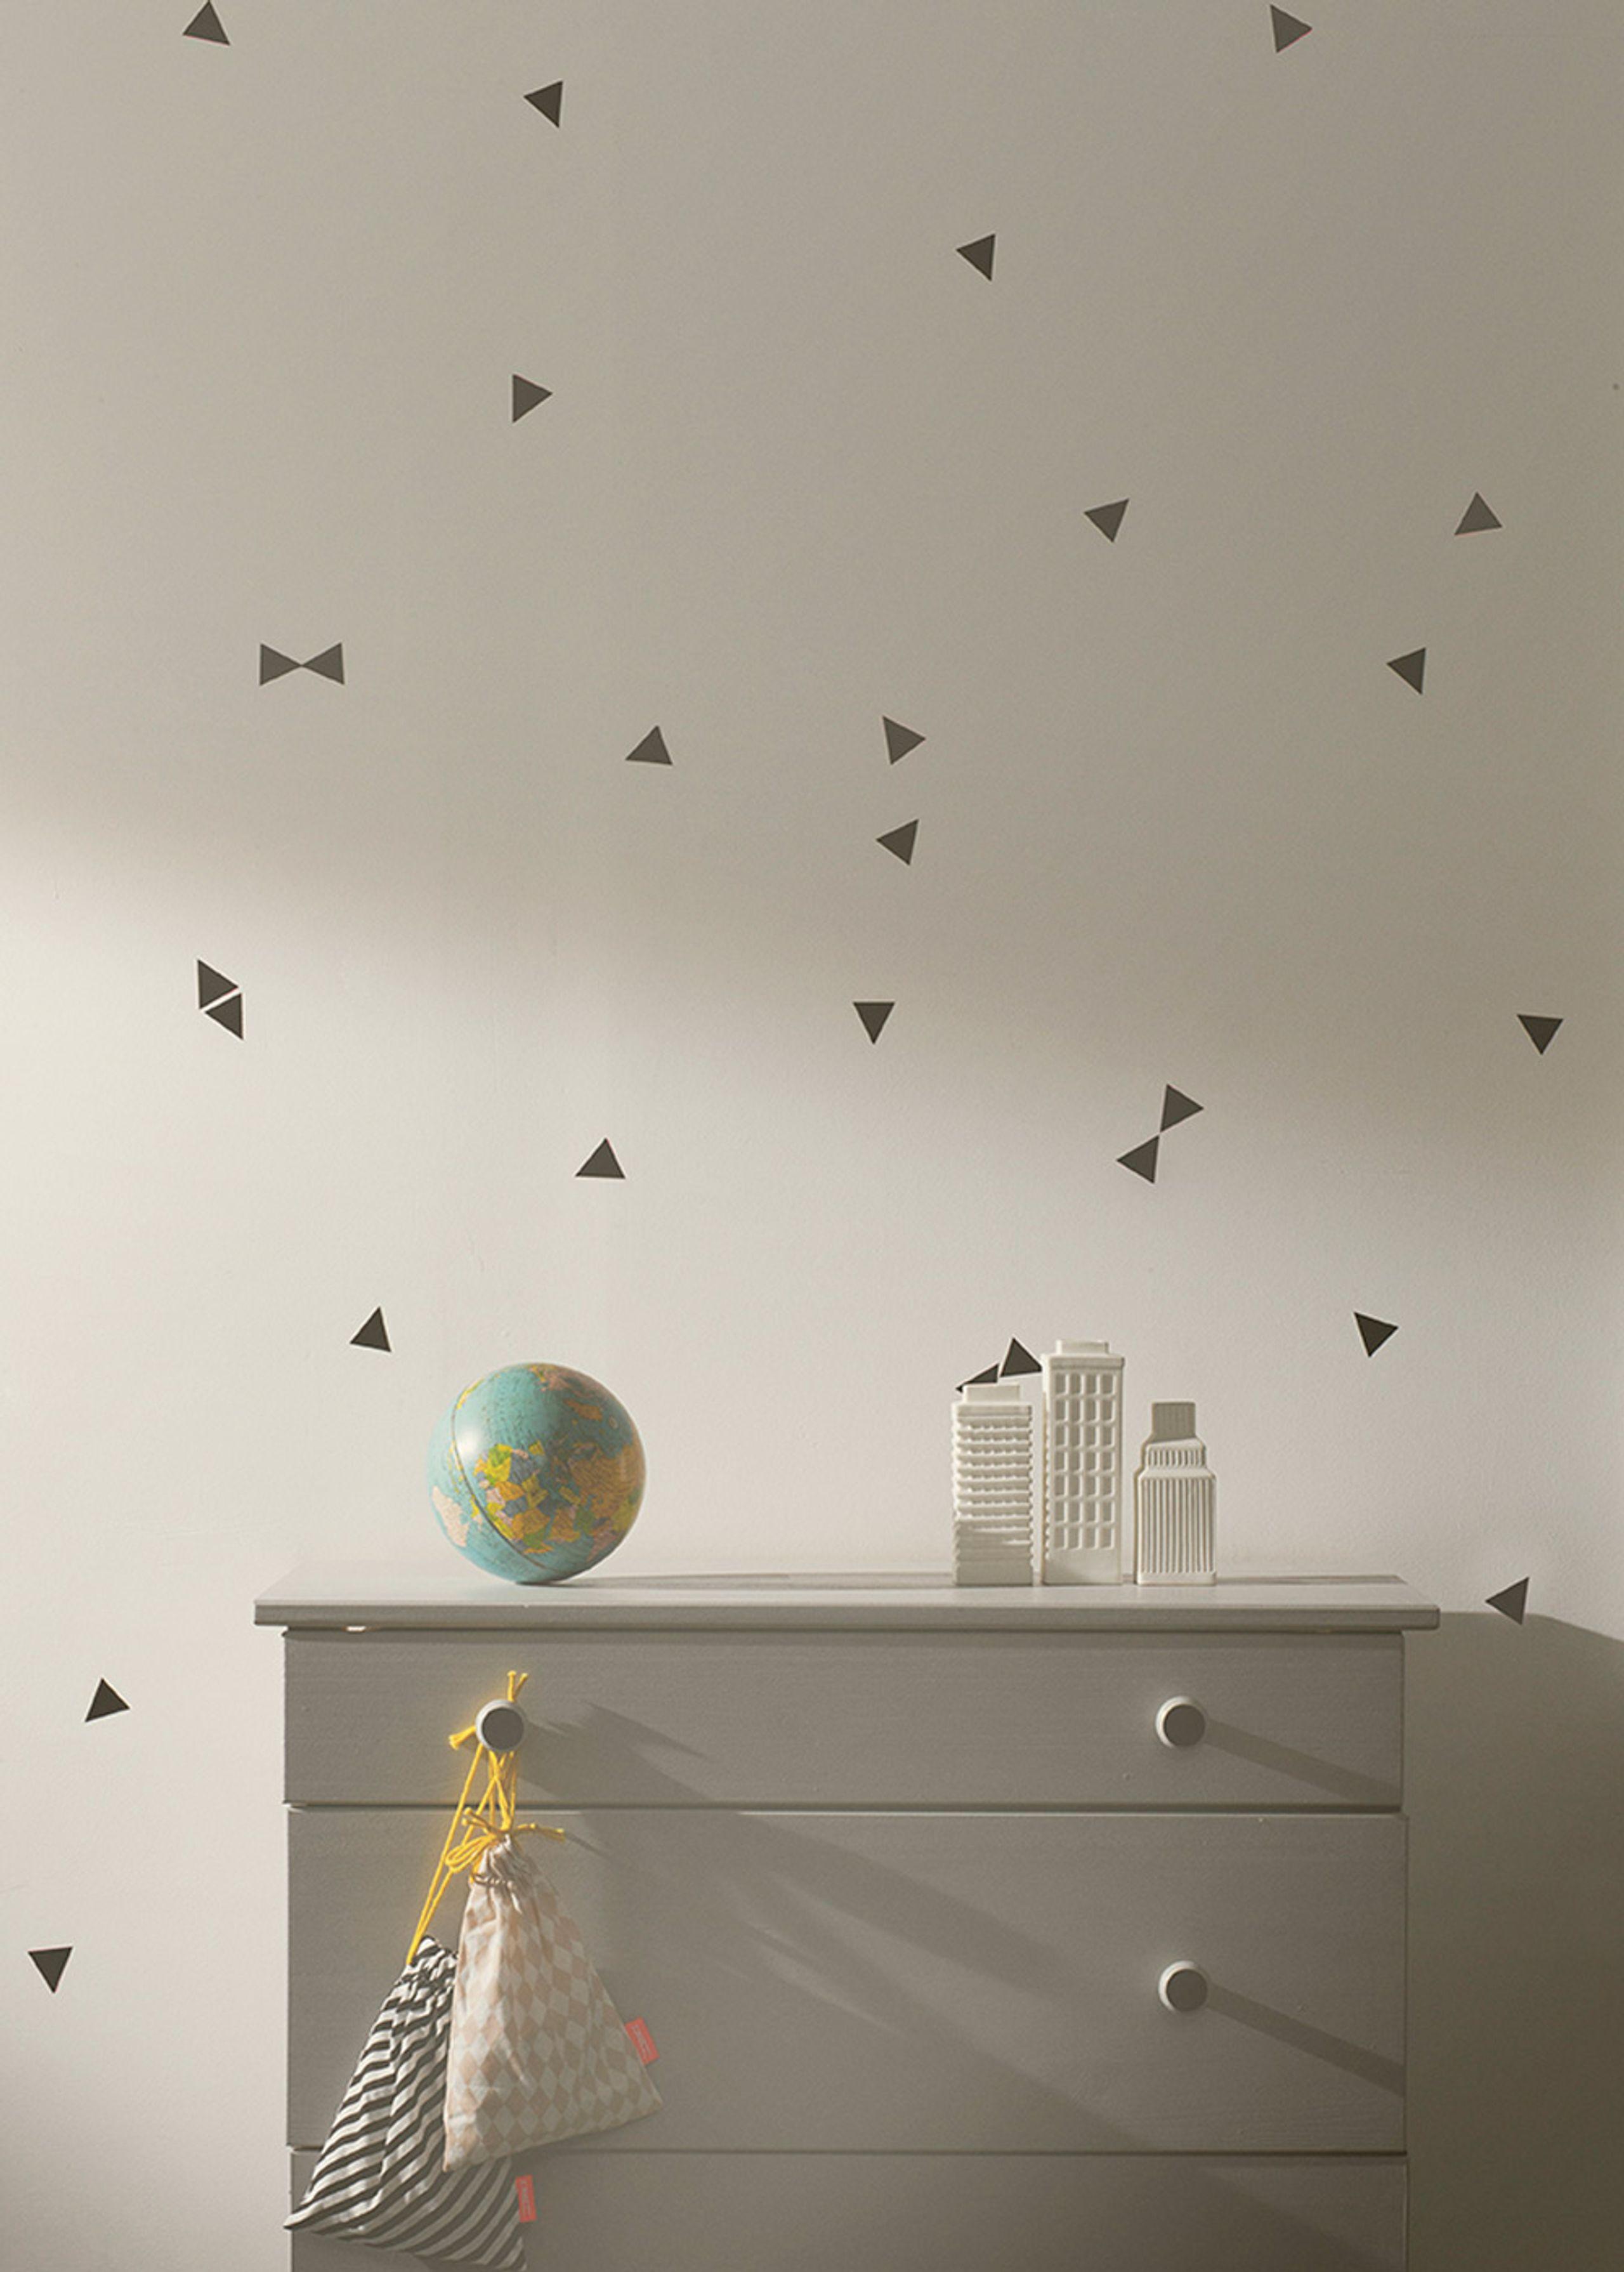 mini triangles wallsticker wallstickers ferm living abc house wallsticker ferm living